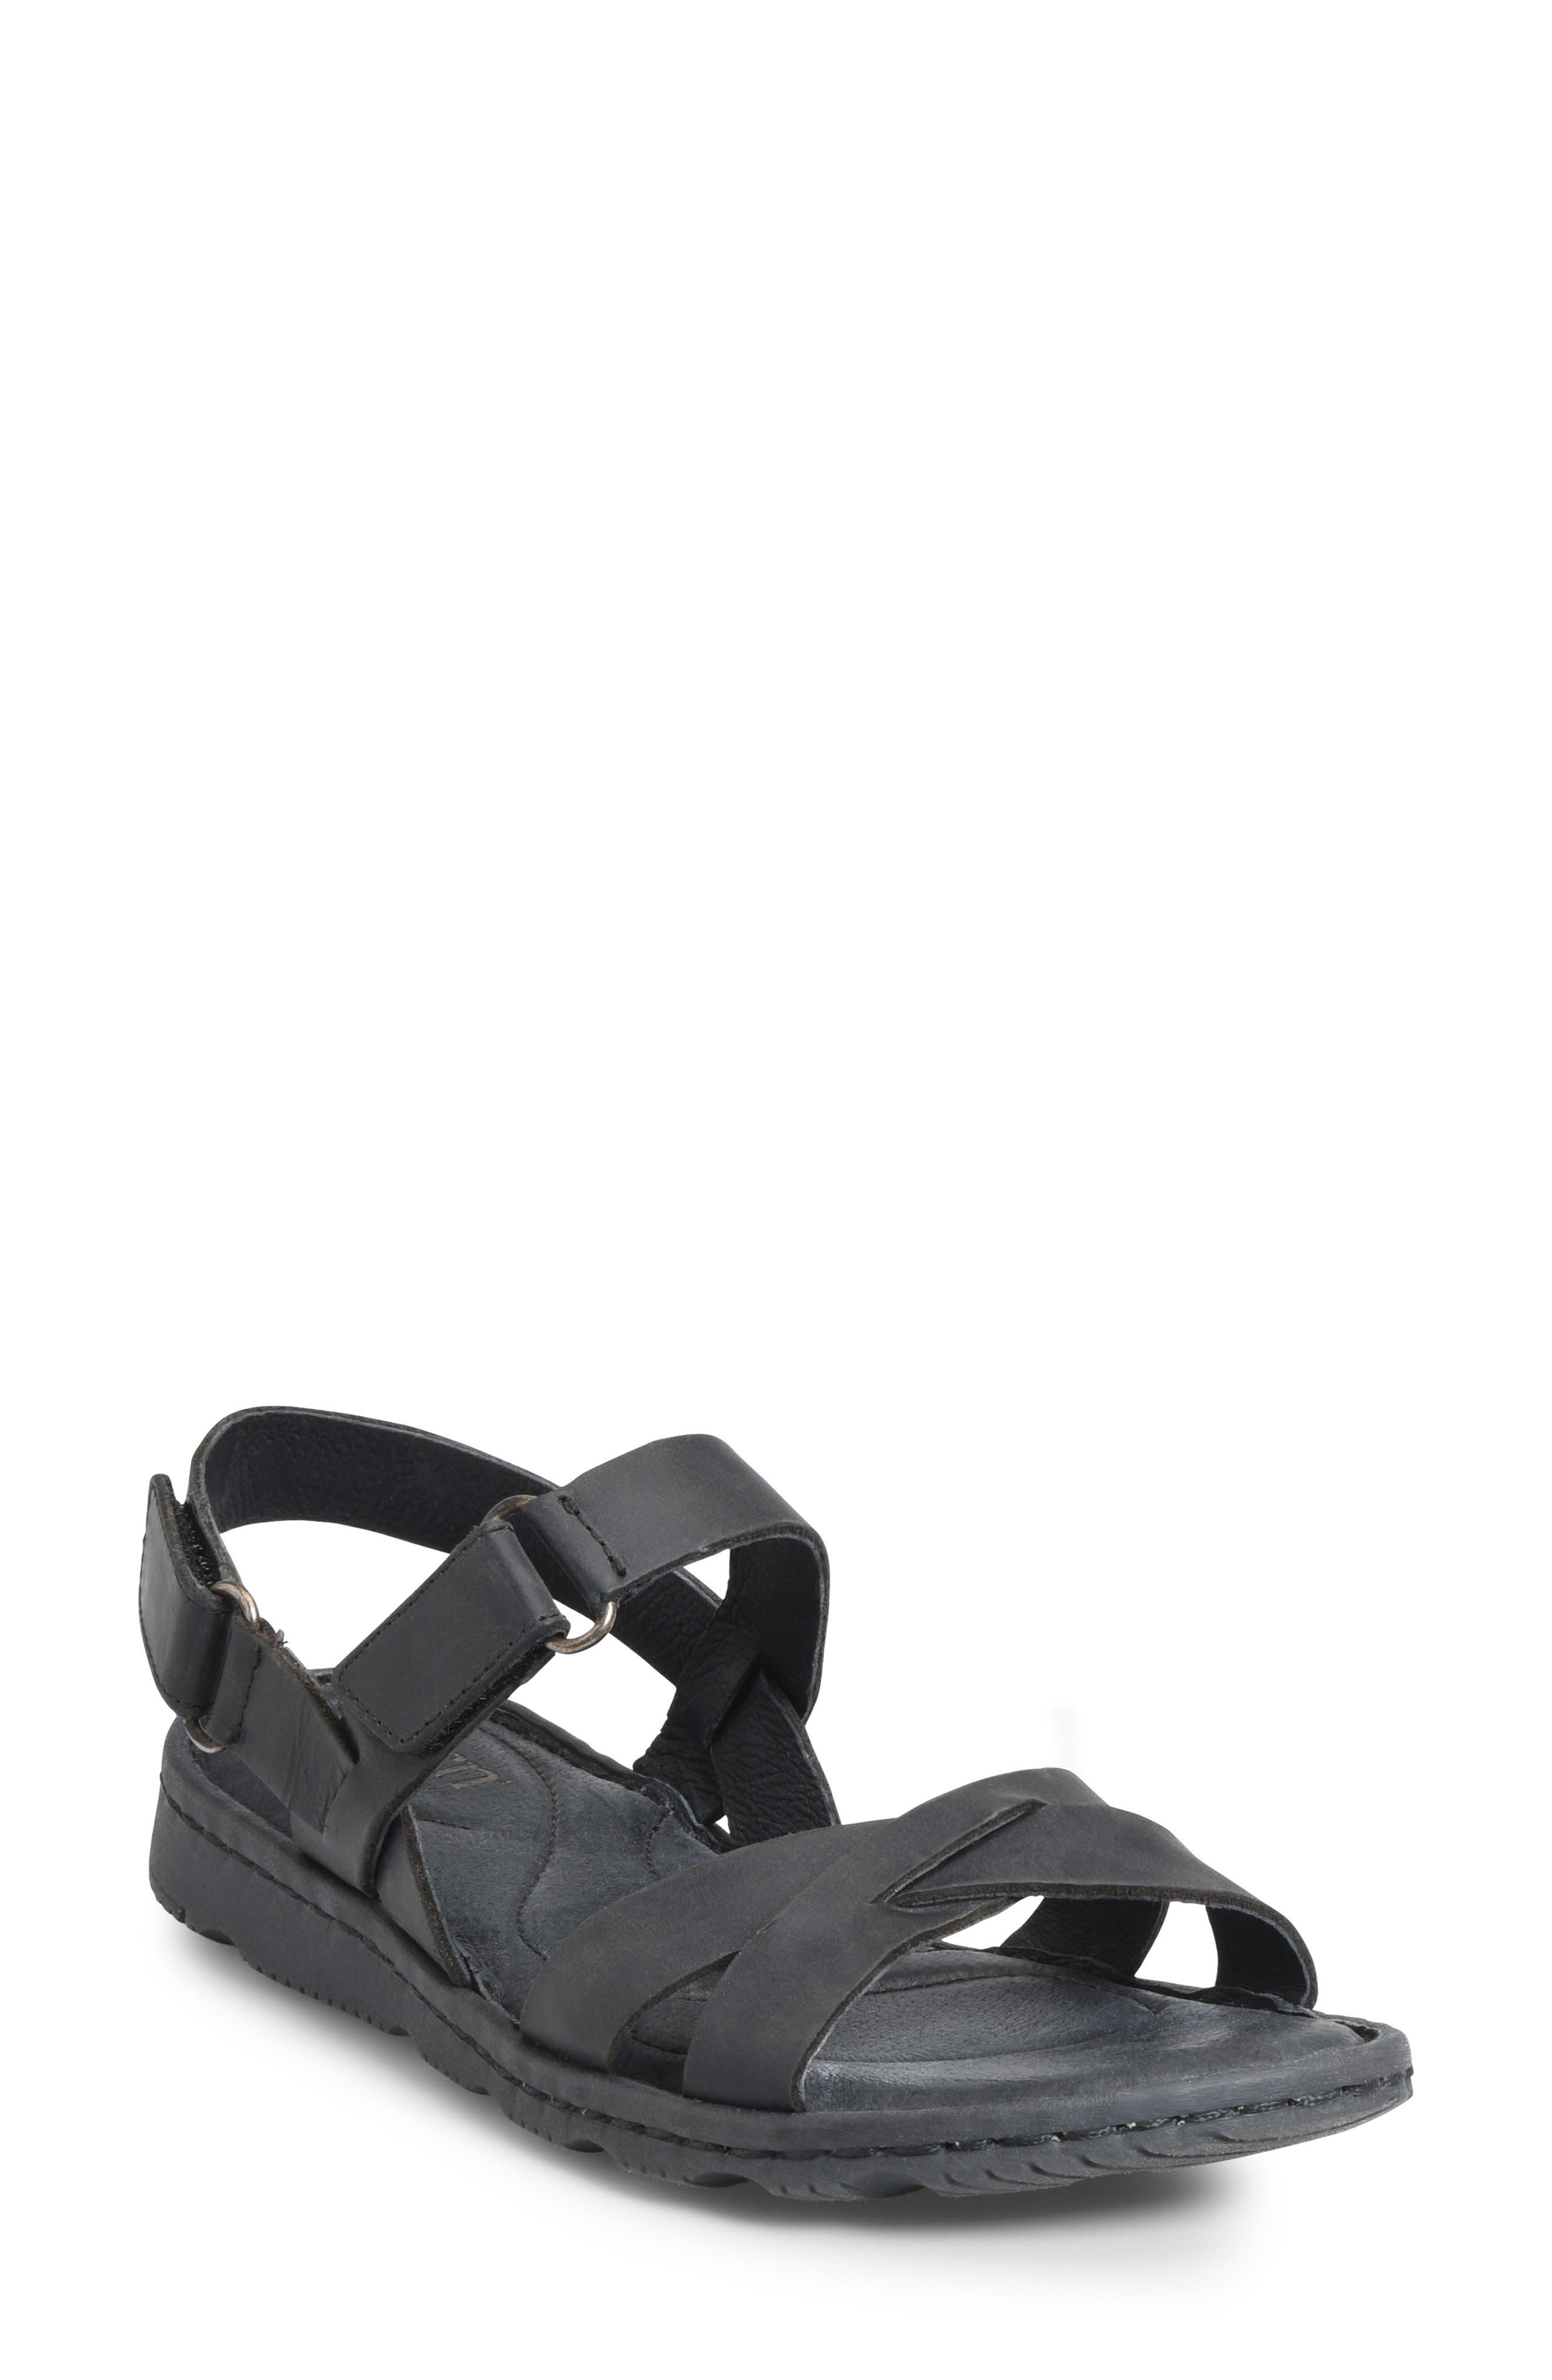 B?rn Jemez Cross Strap Sandal, Black